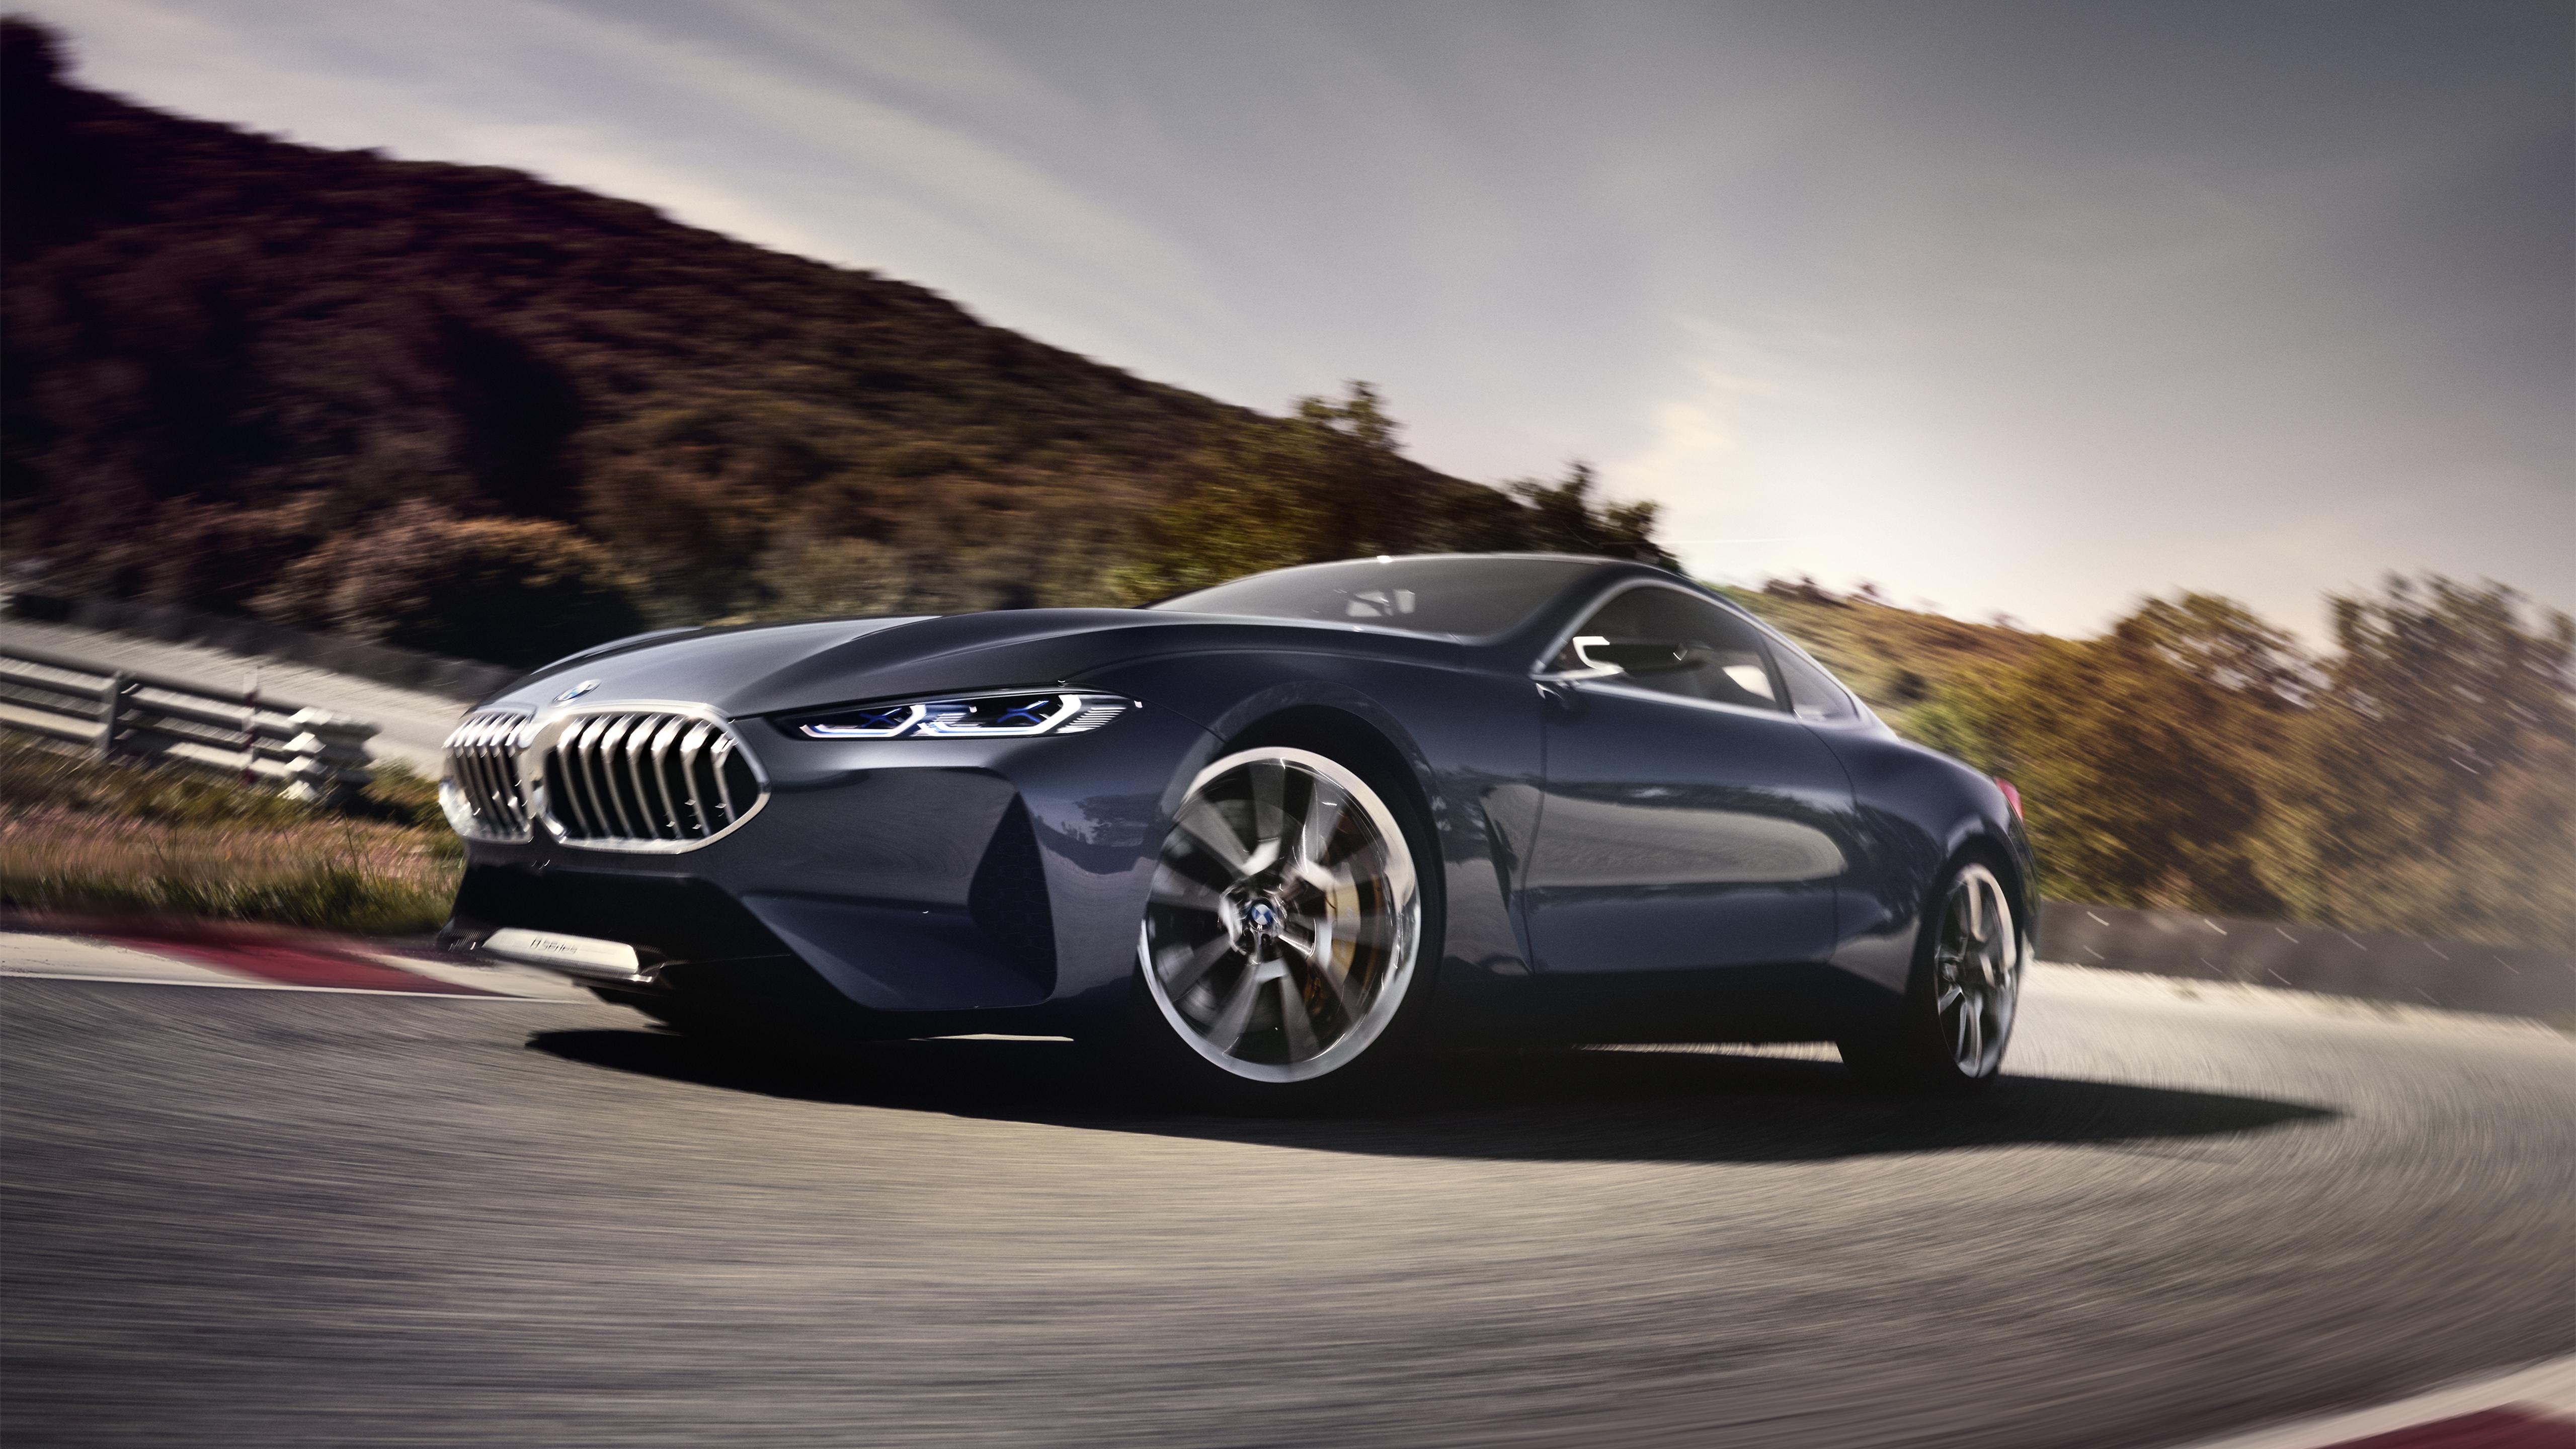 BMW Concept 8 Series 5k Retina Ultra HD Wallpaper ...